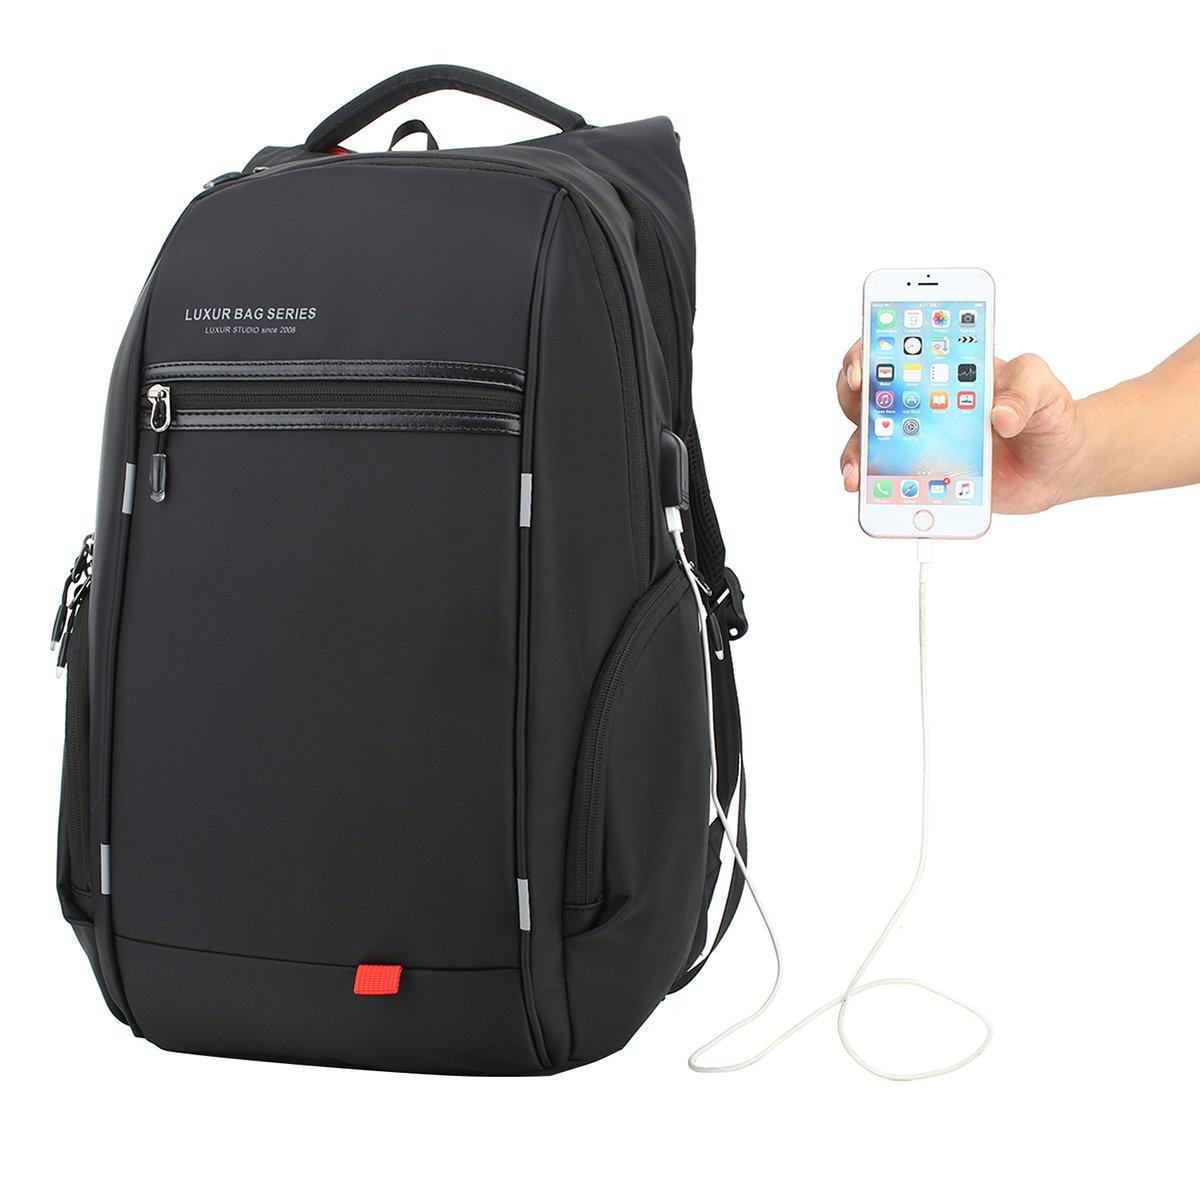 School bag with wheels singapore - Luxur Nylon Waterproof Laptop Backpack Casual School Business Travel Daypack Fit 16 Inch Laptop Black